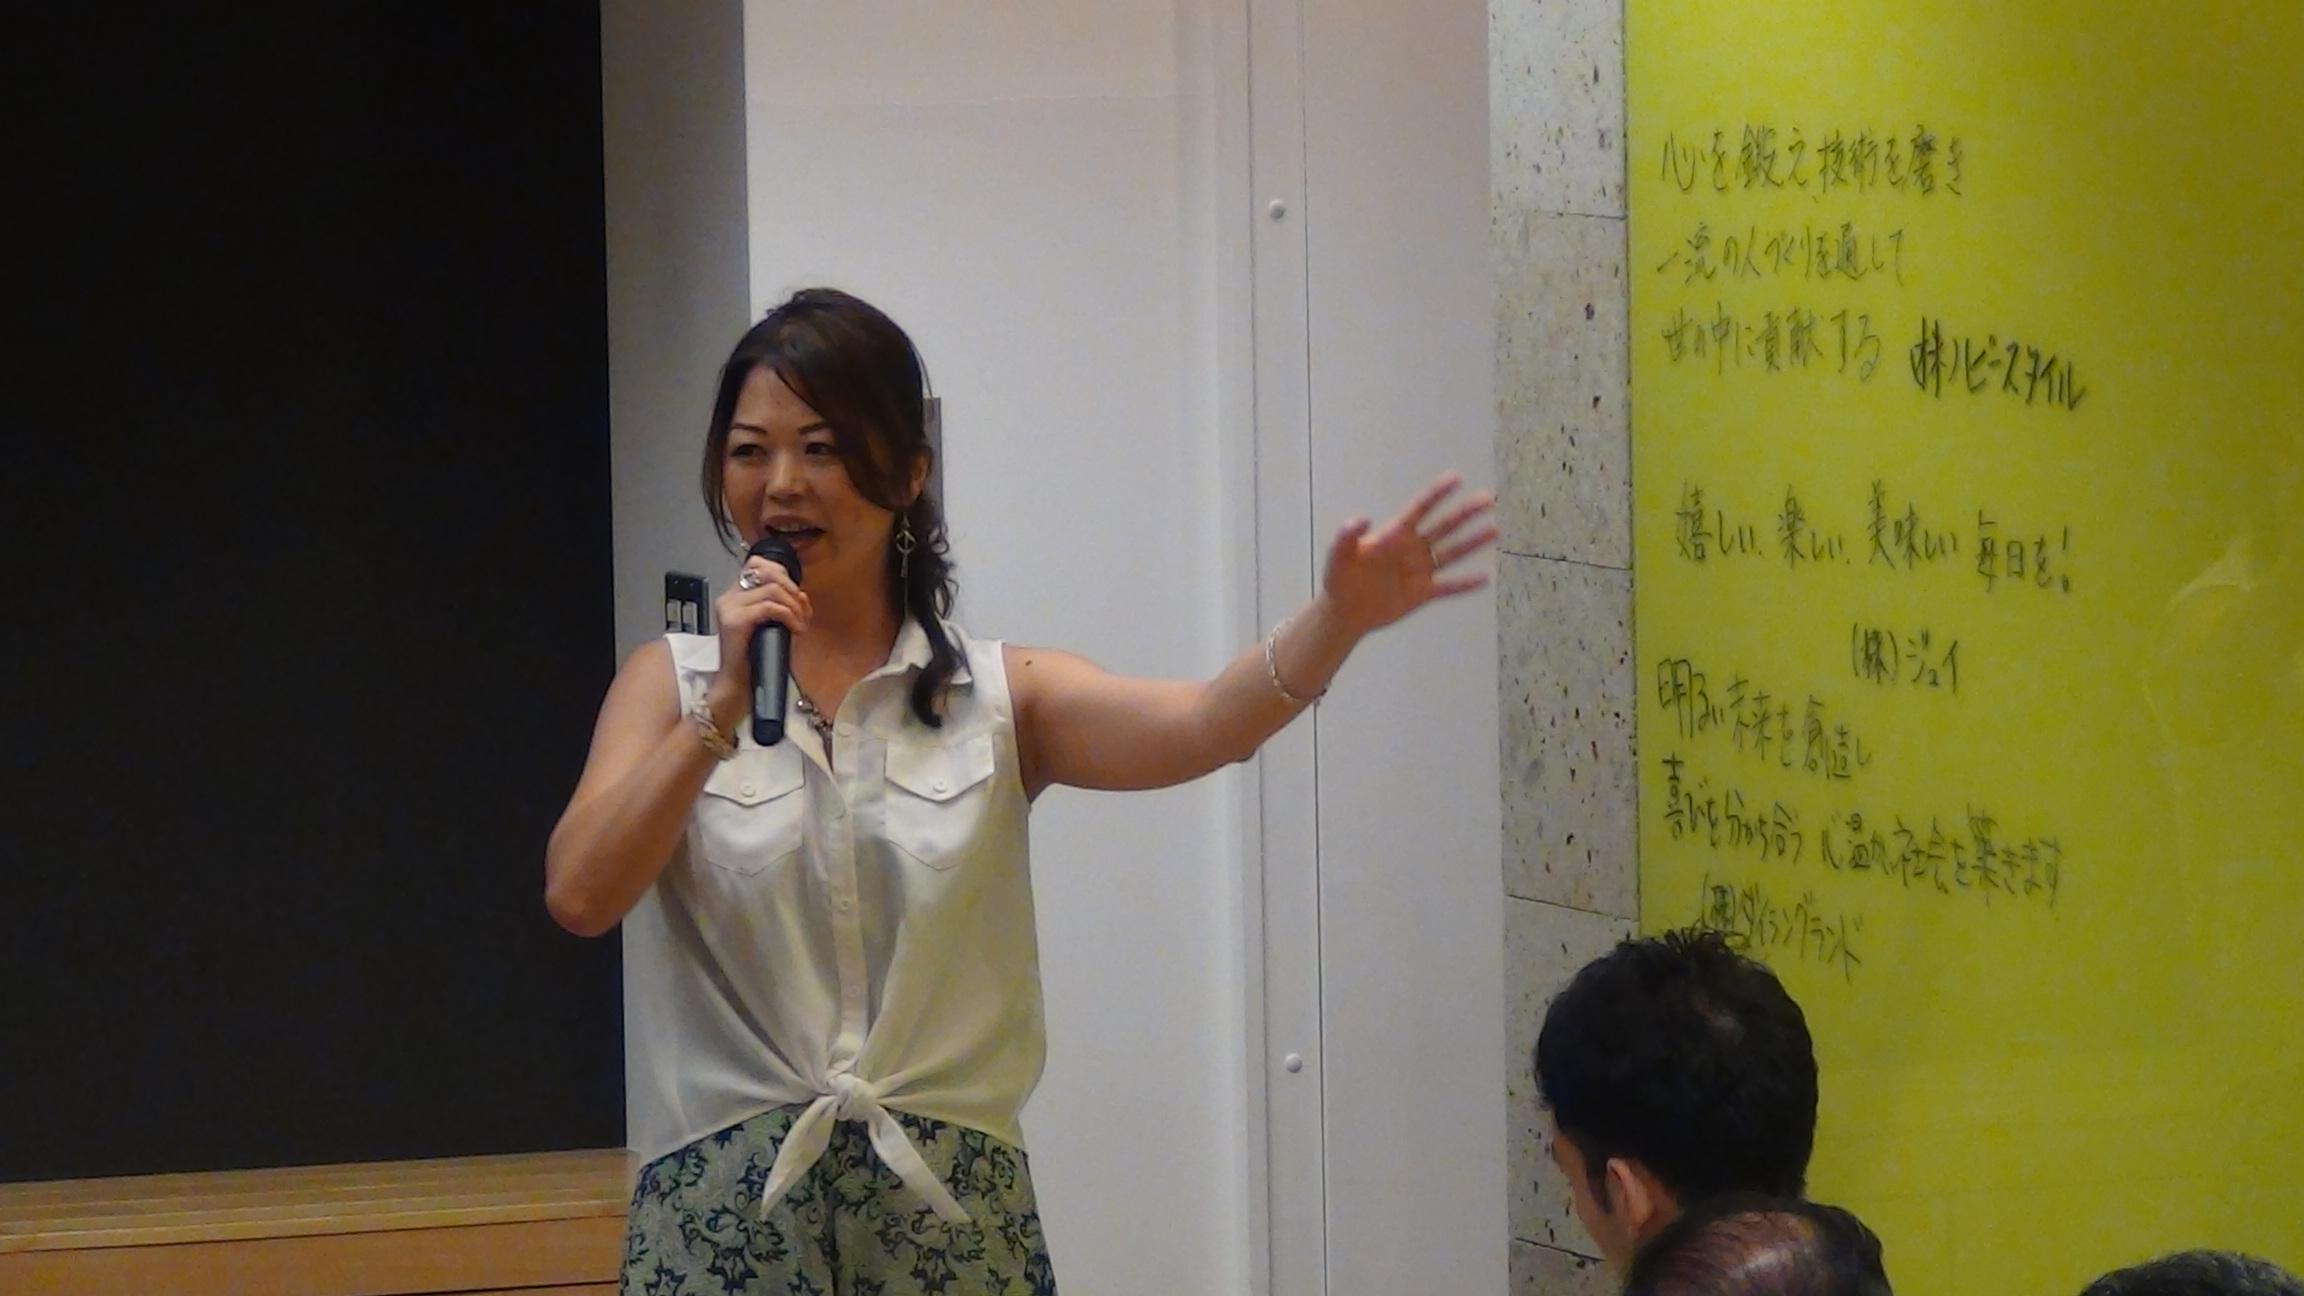 DSC00426 - 2017年8月5日東京思風塾「心が燃える理念とは〜自社の理念を問い直す〜」